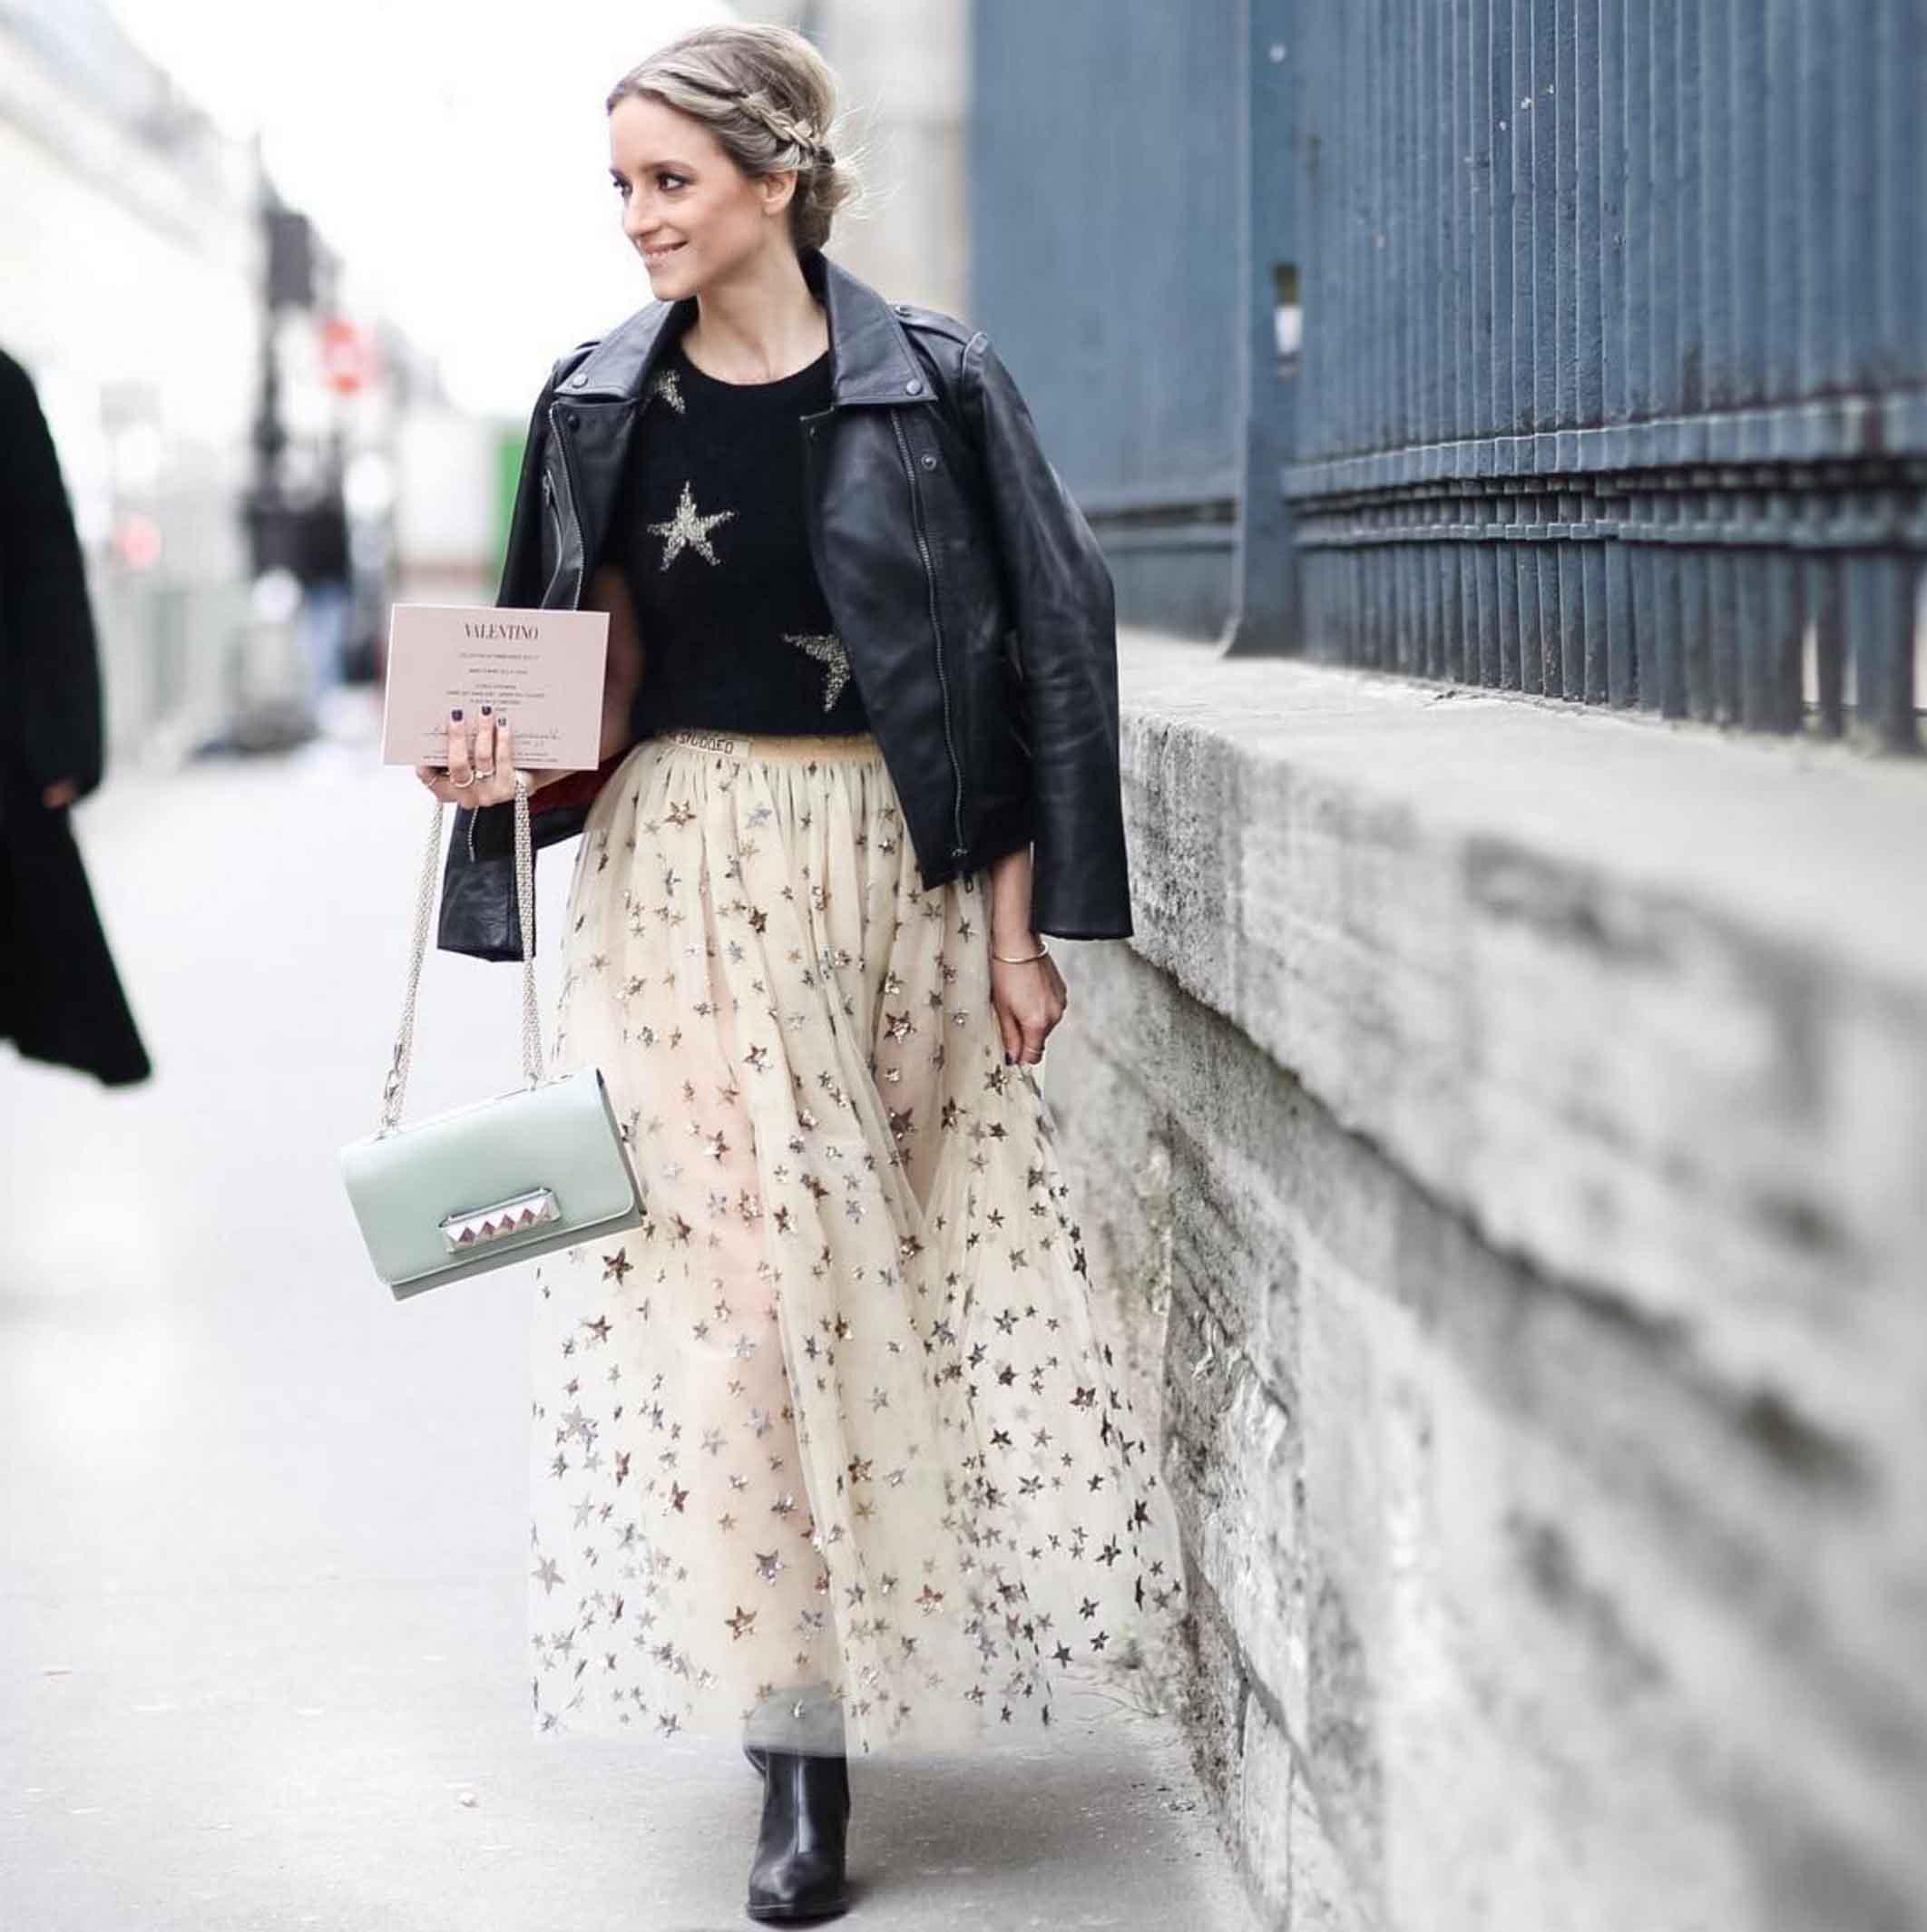 reszie charlotte groeneveld the fashion guitar blogger via instagrm copy